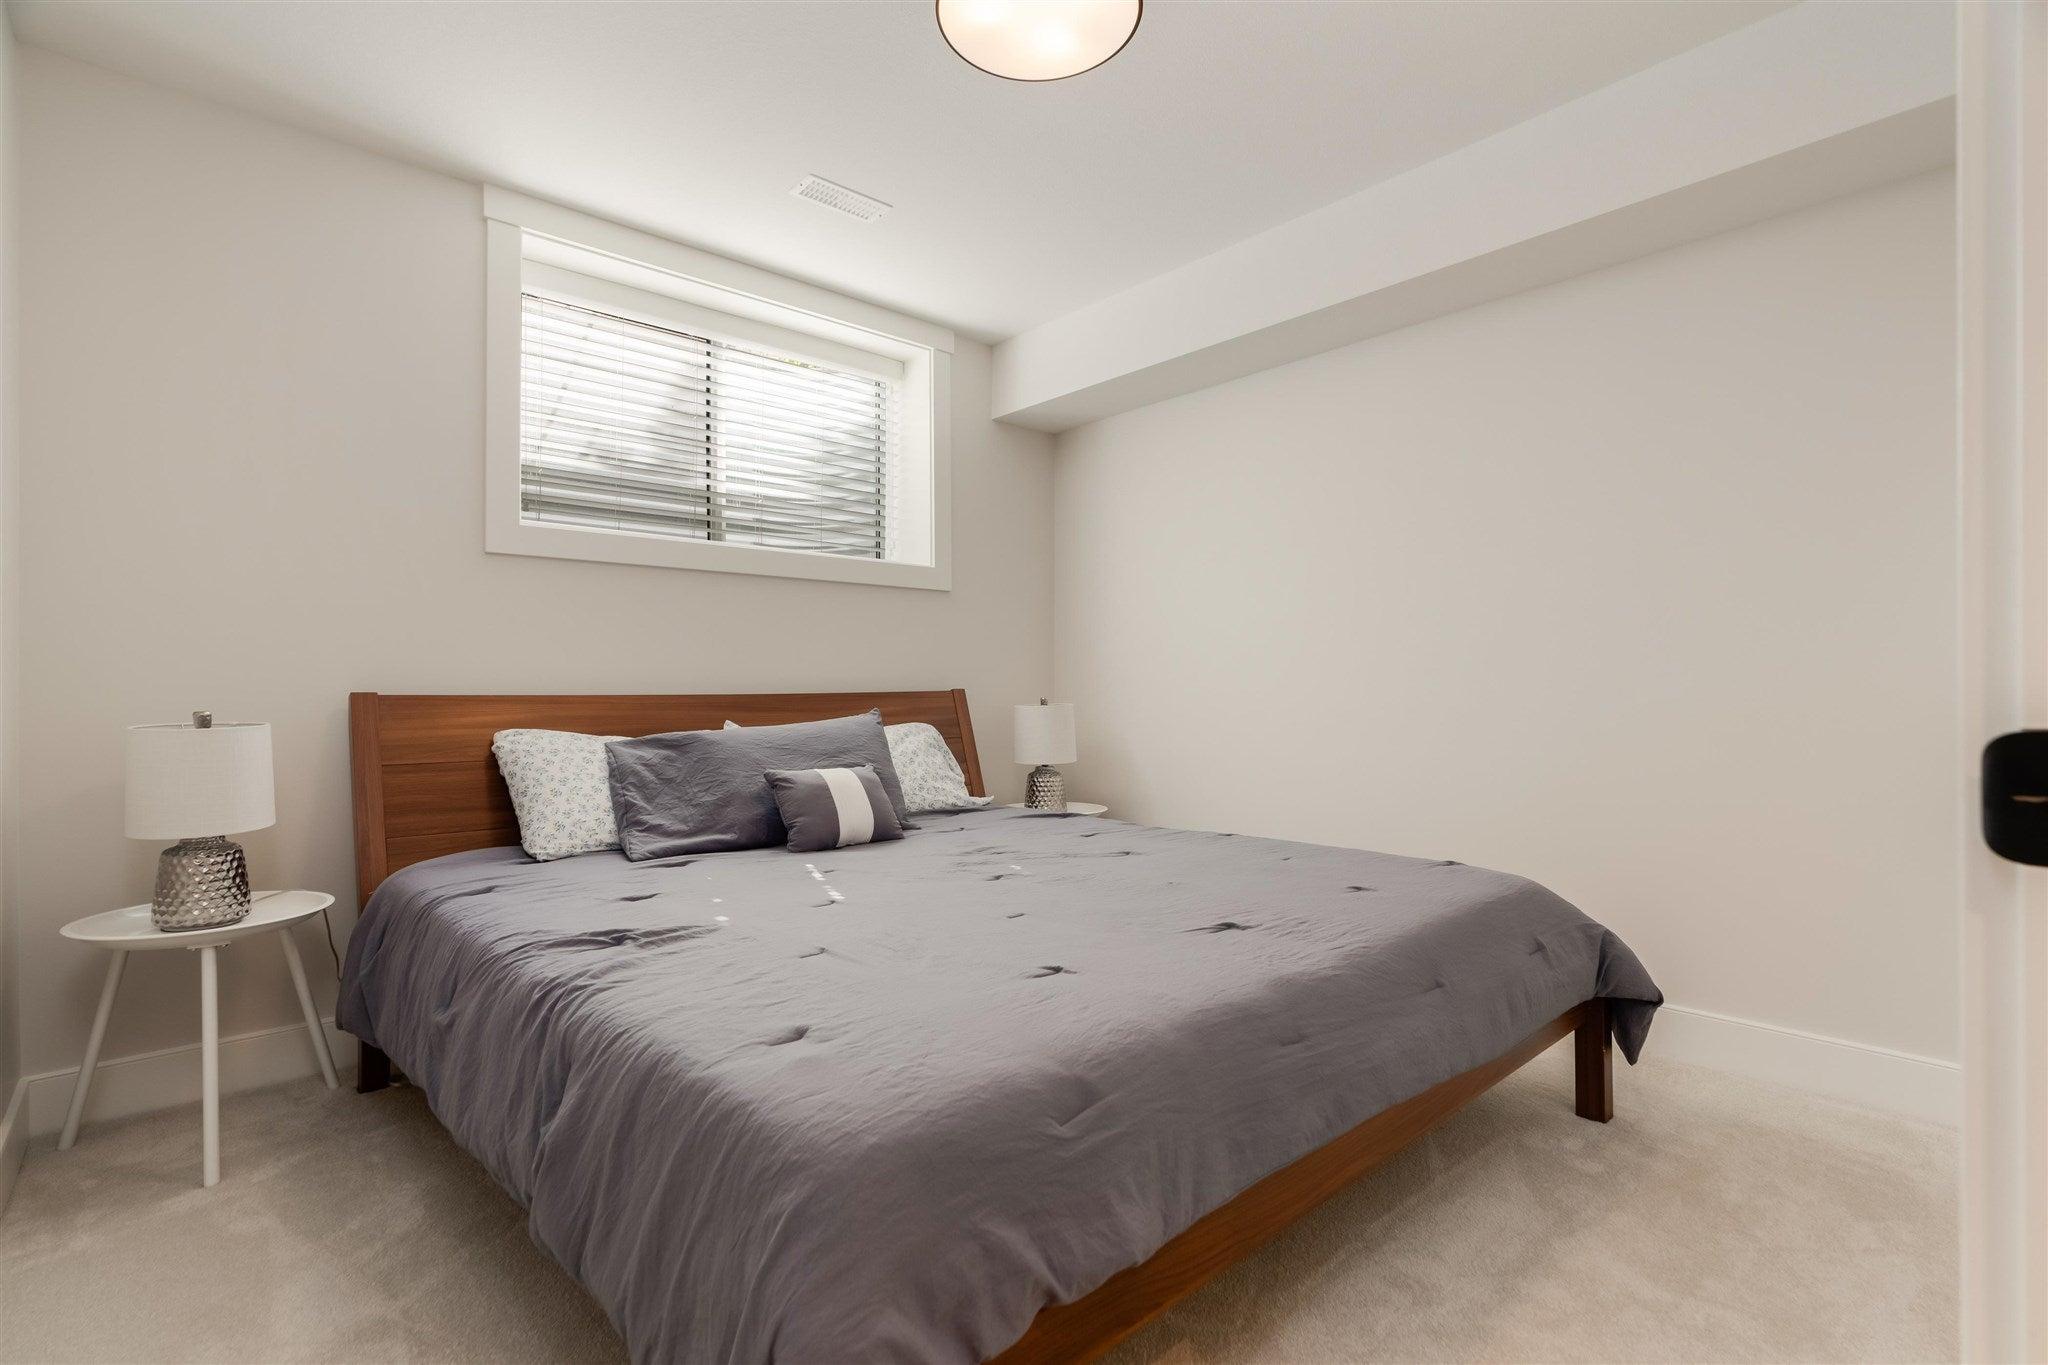 40 21858 47B AVENUE - Murrayville Townhouse for sale, 4 Bedrooms (R2603956) - #29